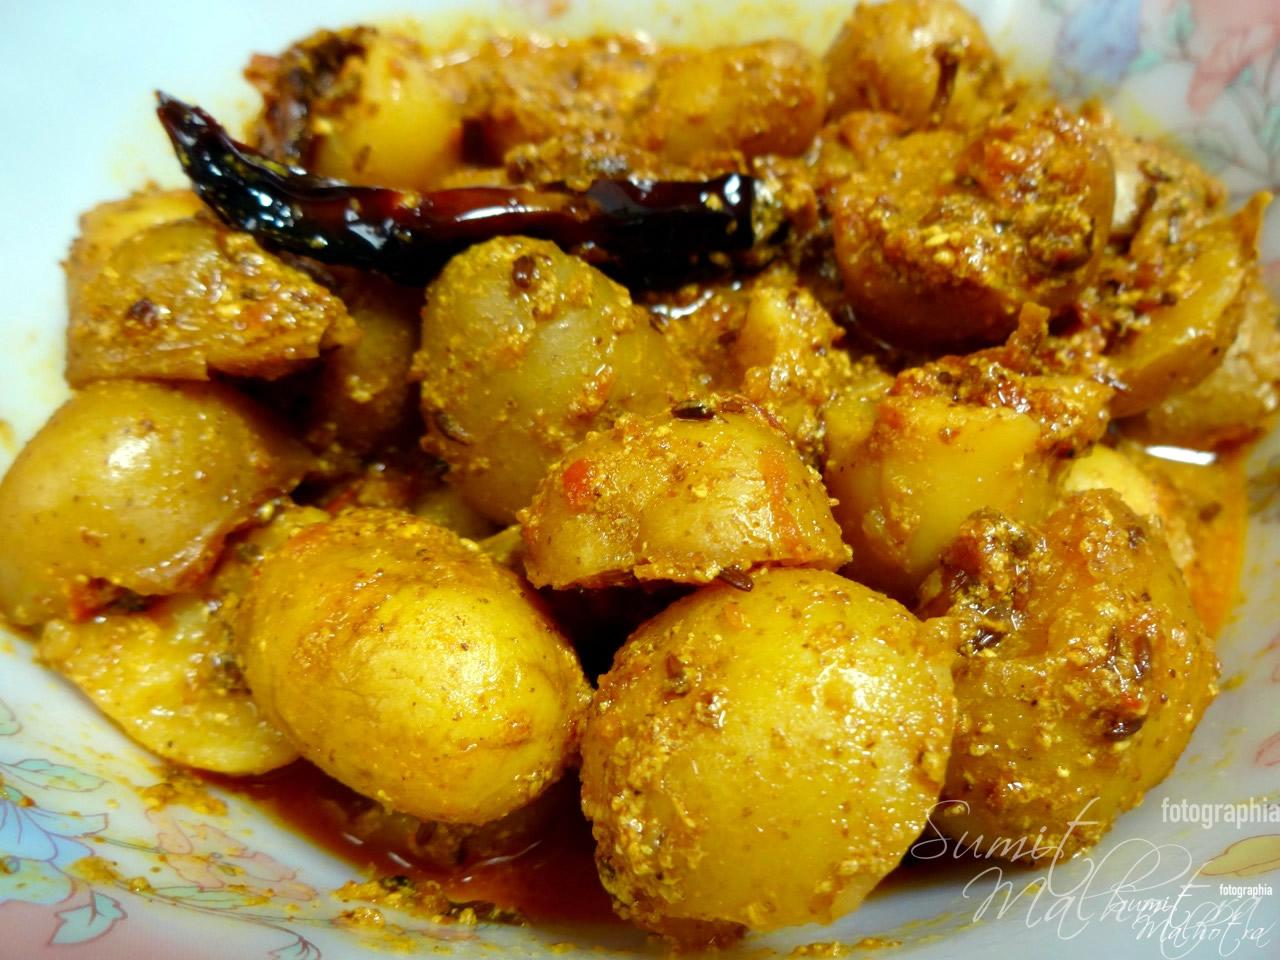 Dahi Wale Chatpate Aloo, Potatoes in Tangy Curd Gravy or Dahi Aloo